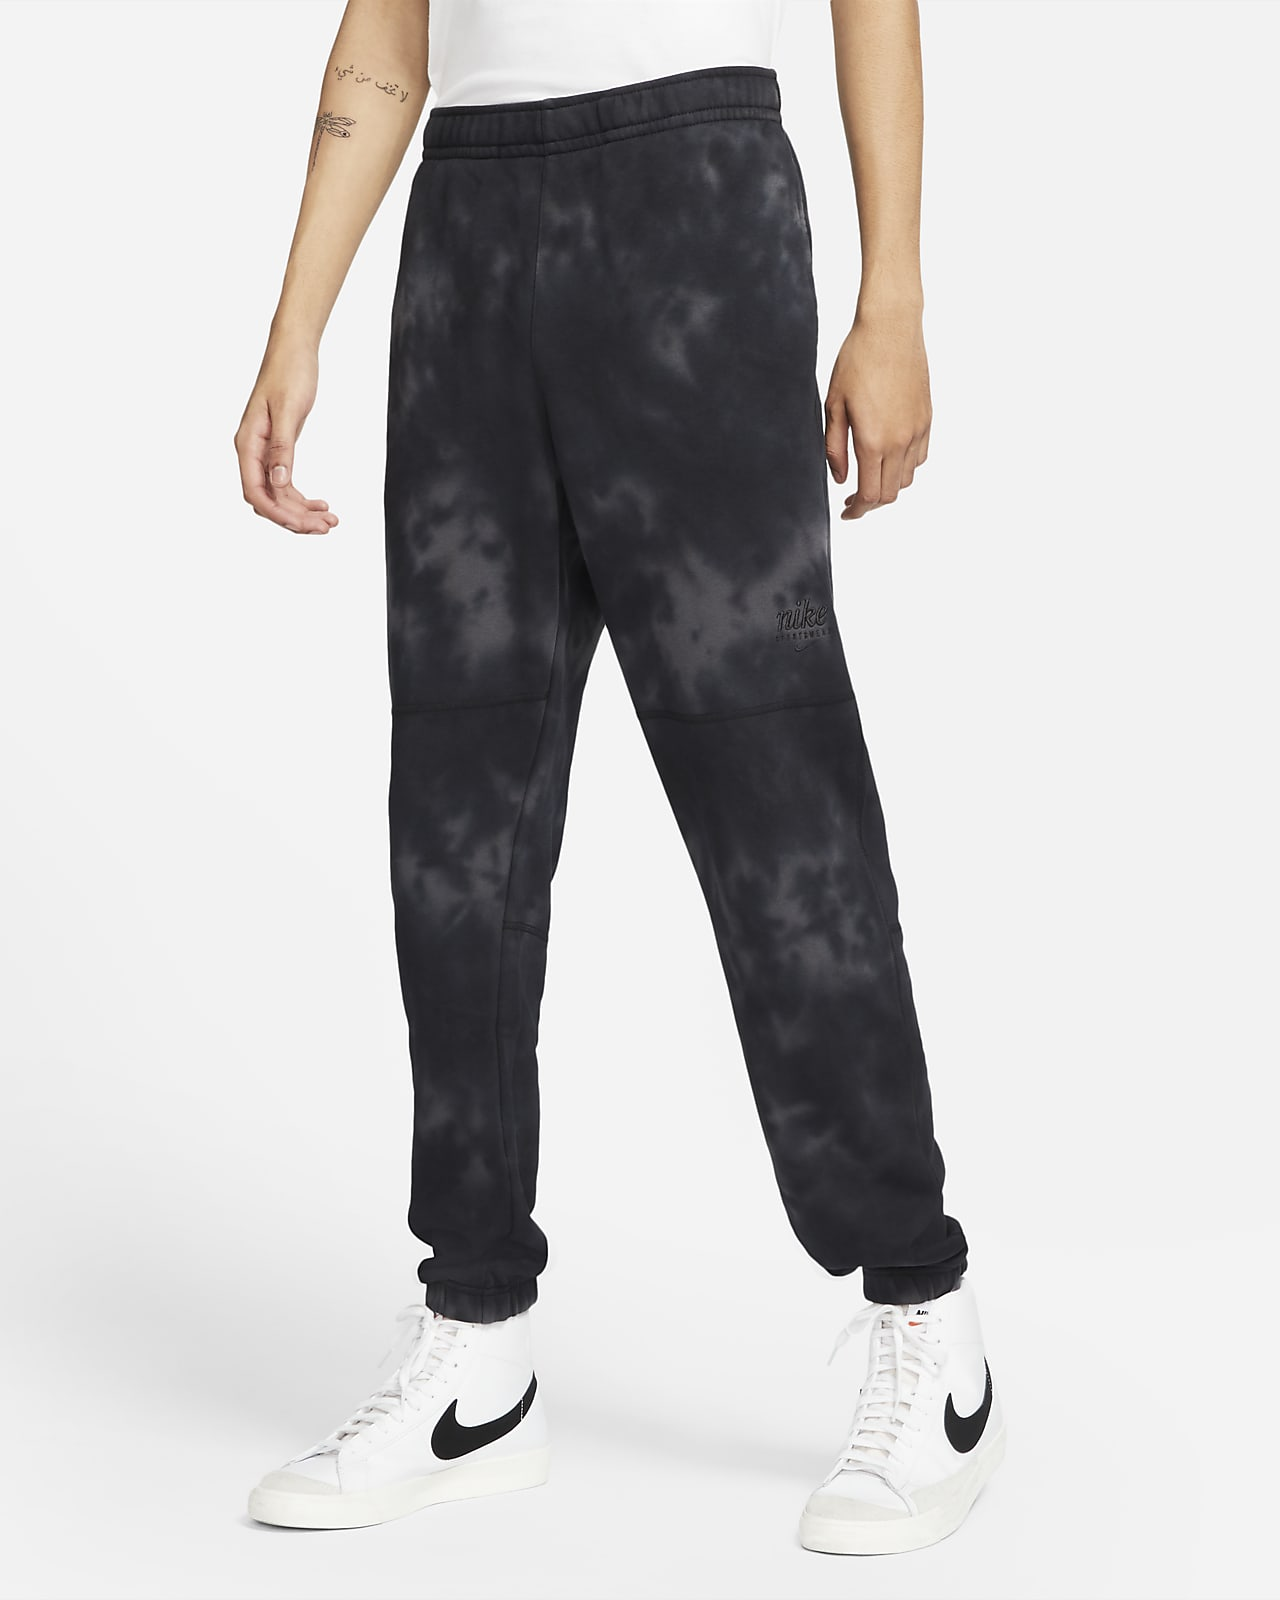 Nike Sportswear Club Men's Tie-Dye French Terry Pants